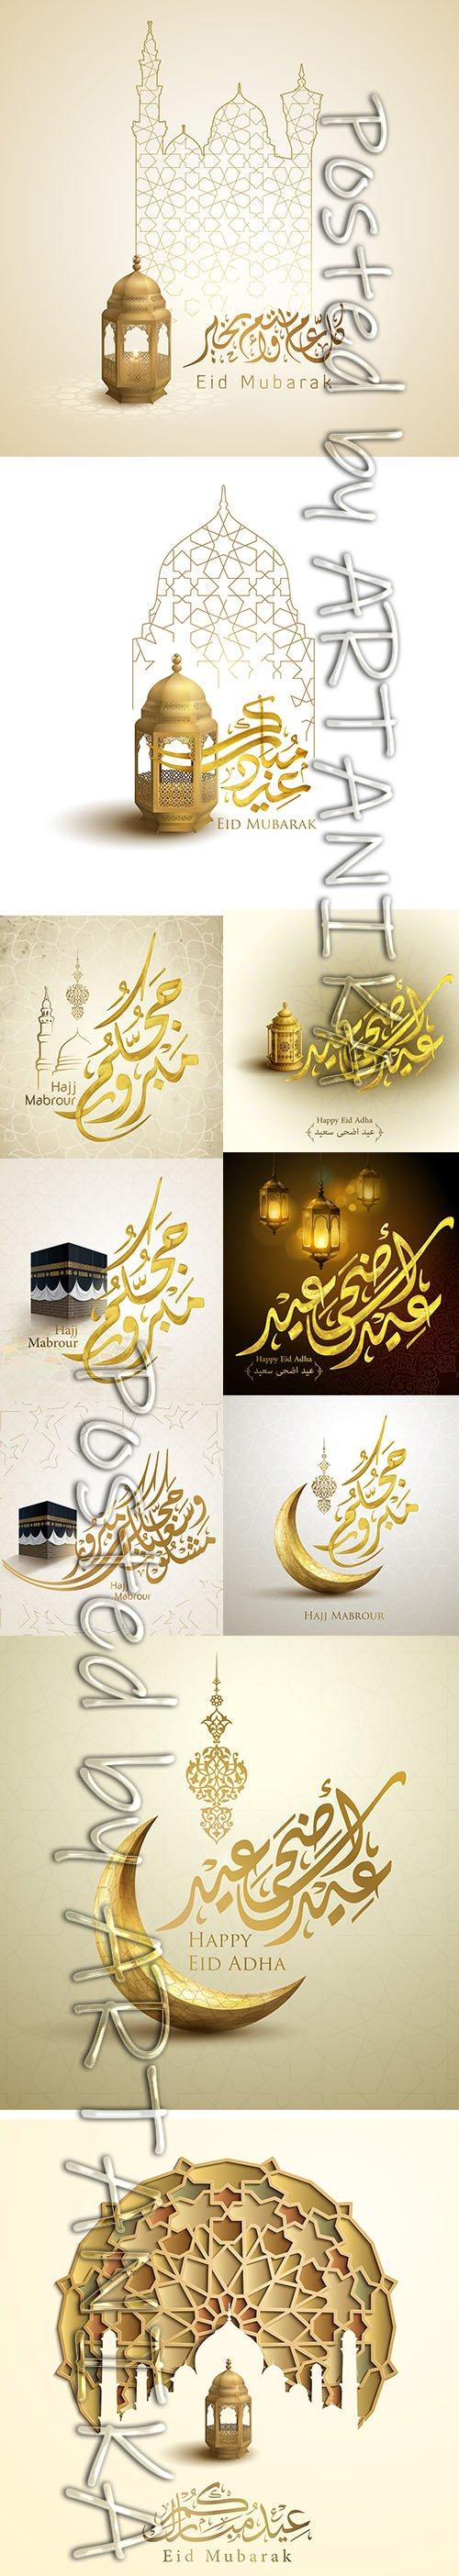 Eid Adha Mubarak Arabic Calligraphy Illustrations Set Vol 2